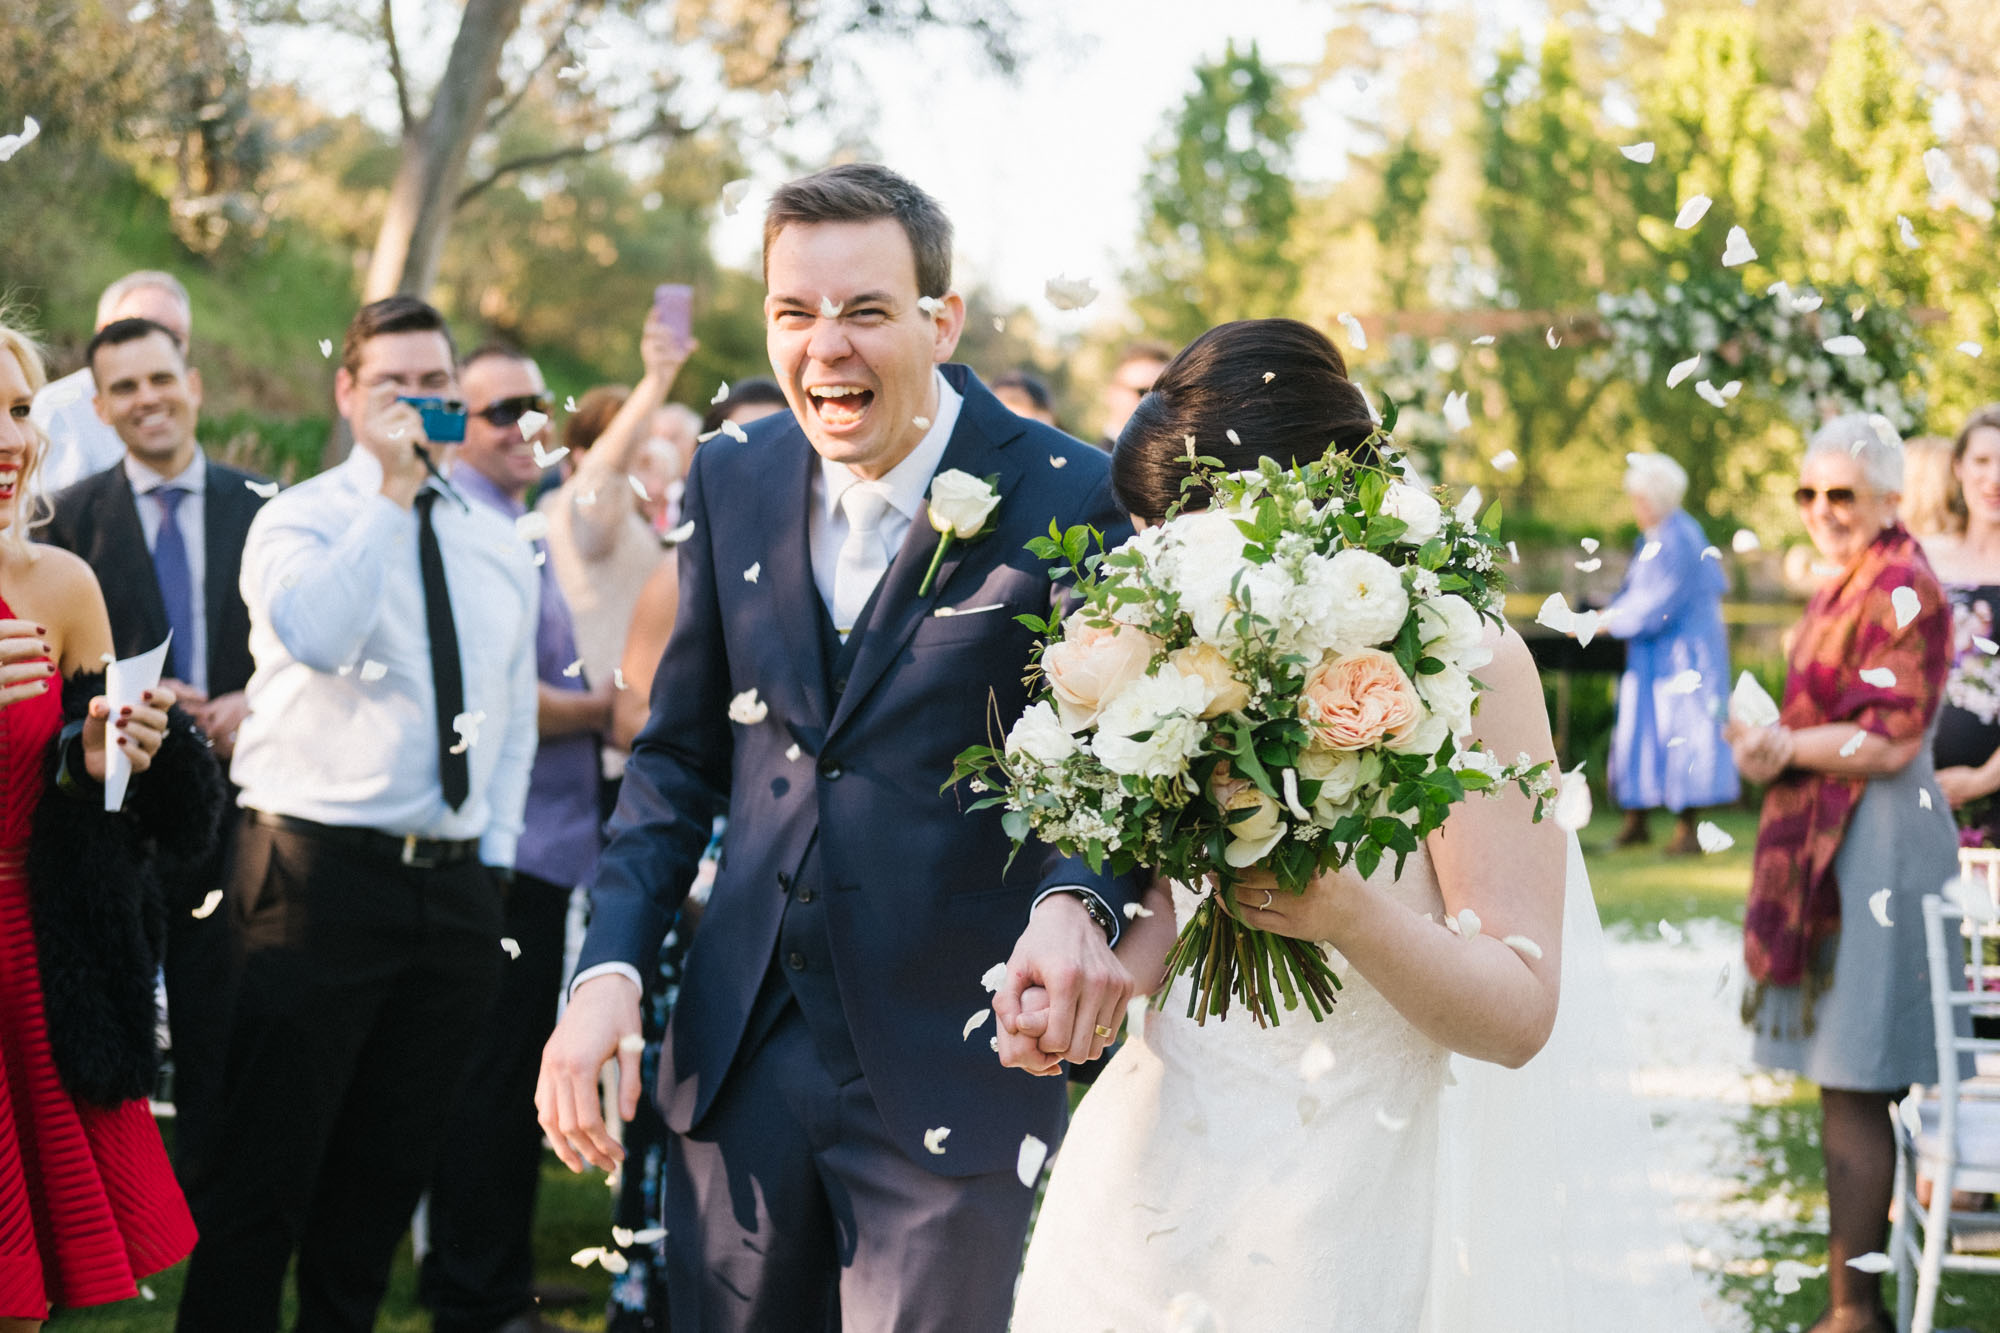 Glen-Ewin-Estate-wedding-photography-050.jpg